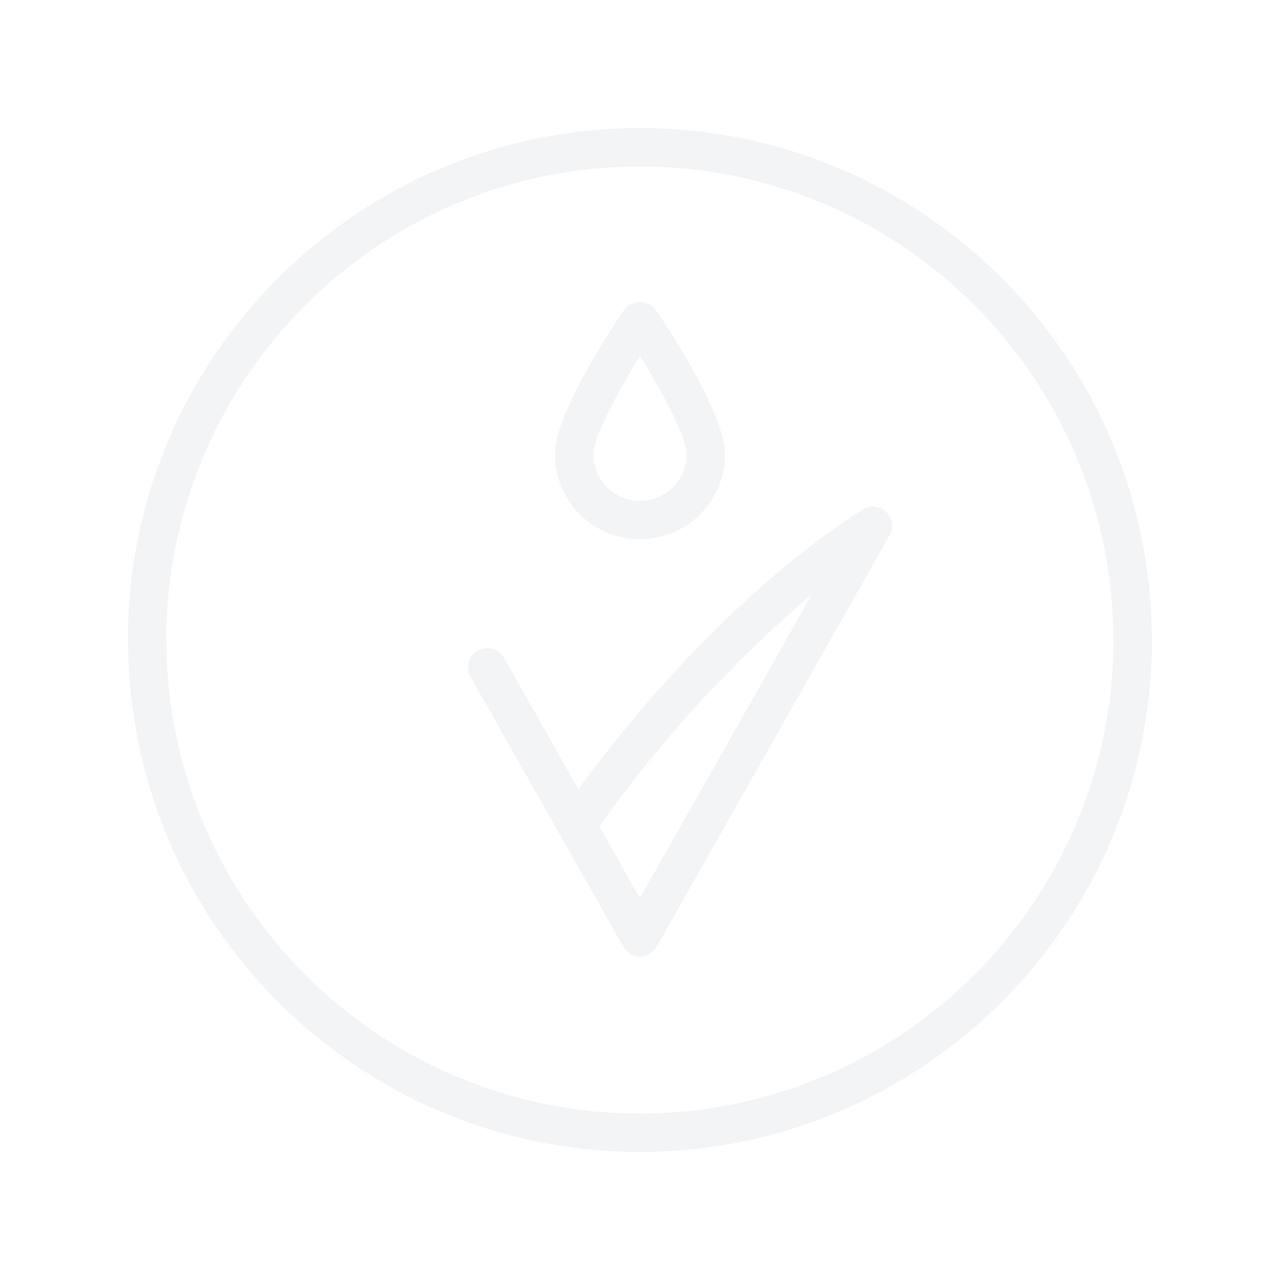 MINIGOLD Circline Earrings